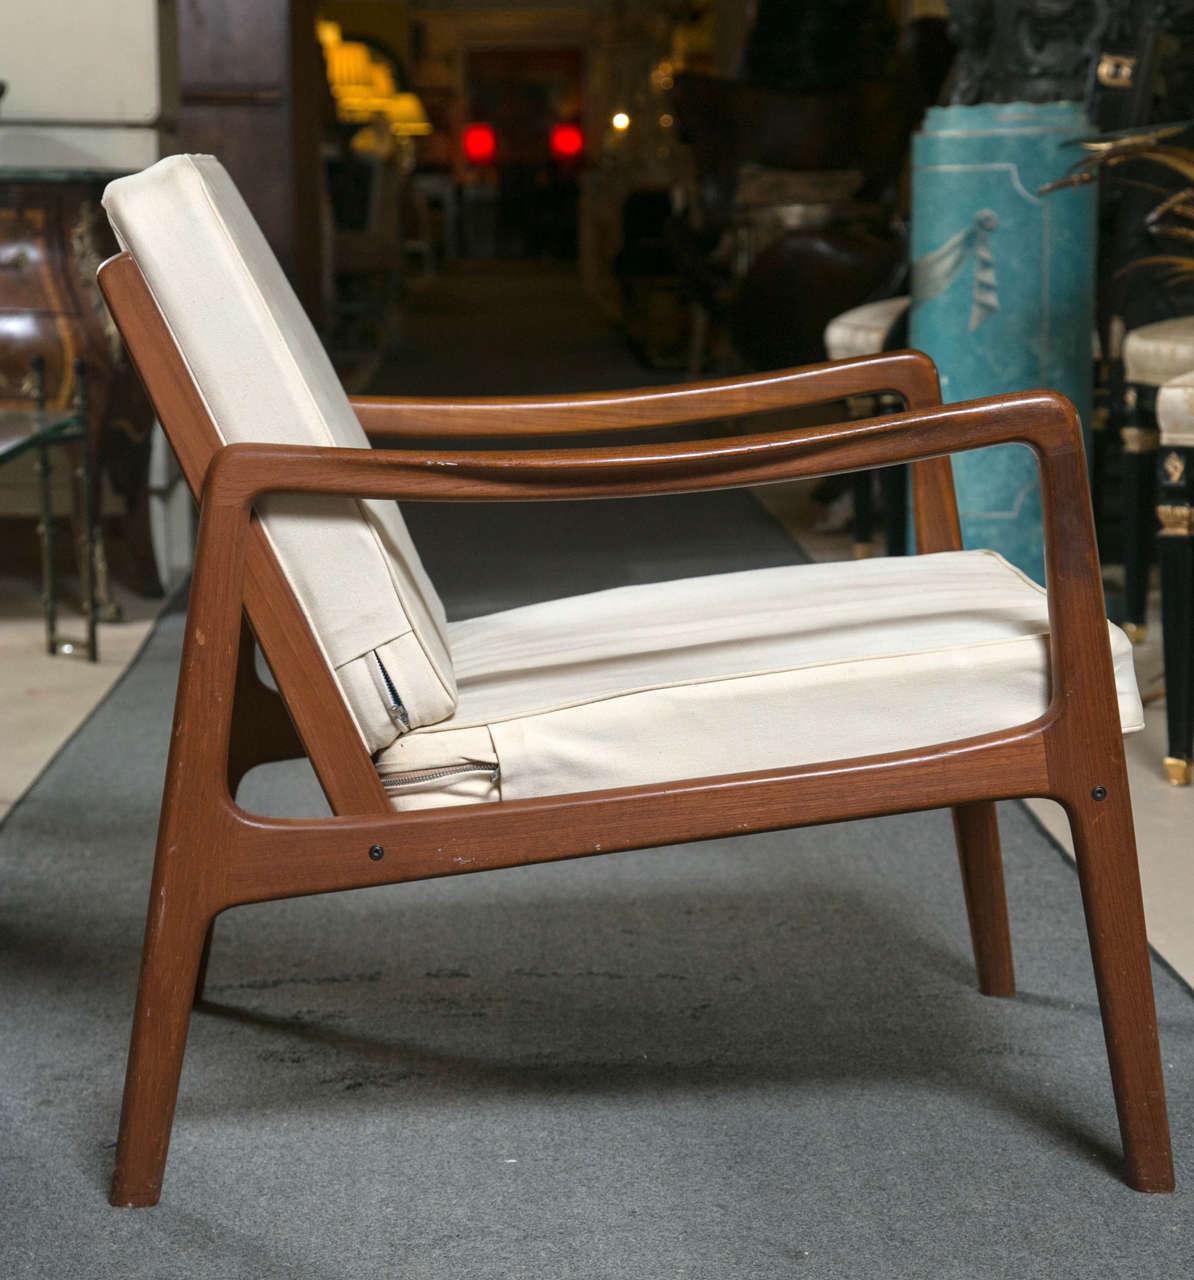 Perfect Mid Century Modern Ole Wanscher Mid Century Teak Lounge Chair By John Stuart  Sleek